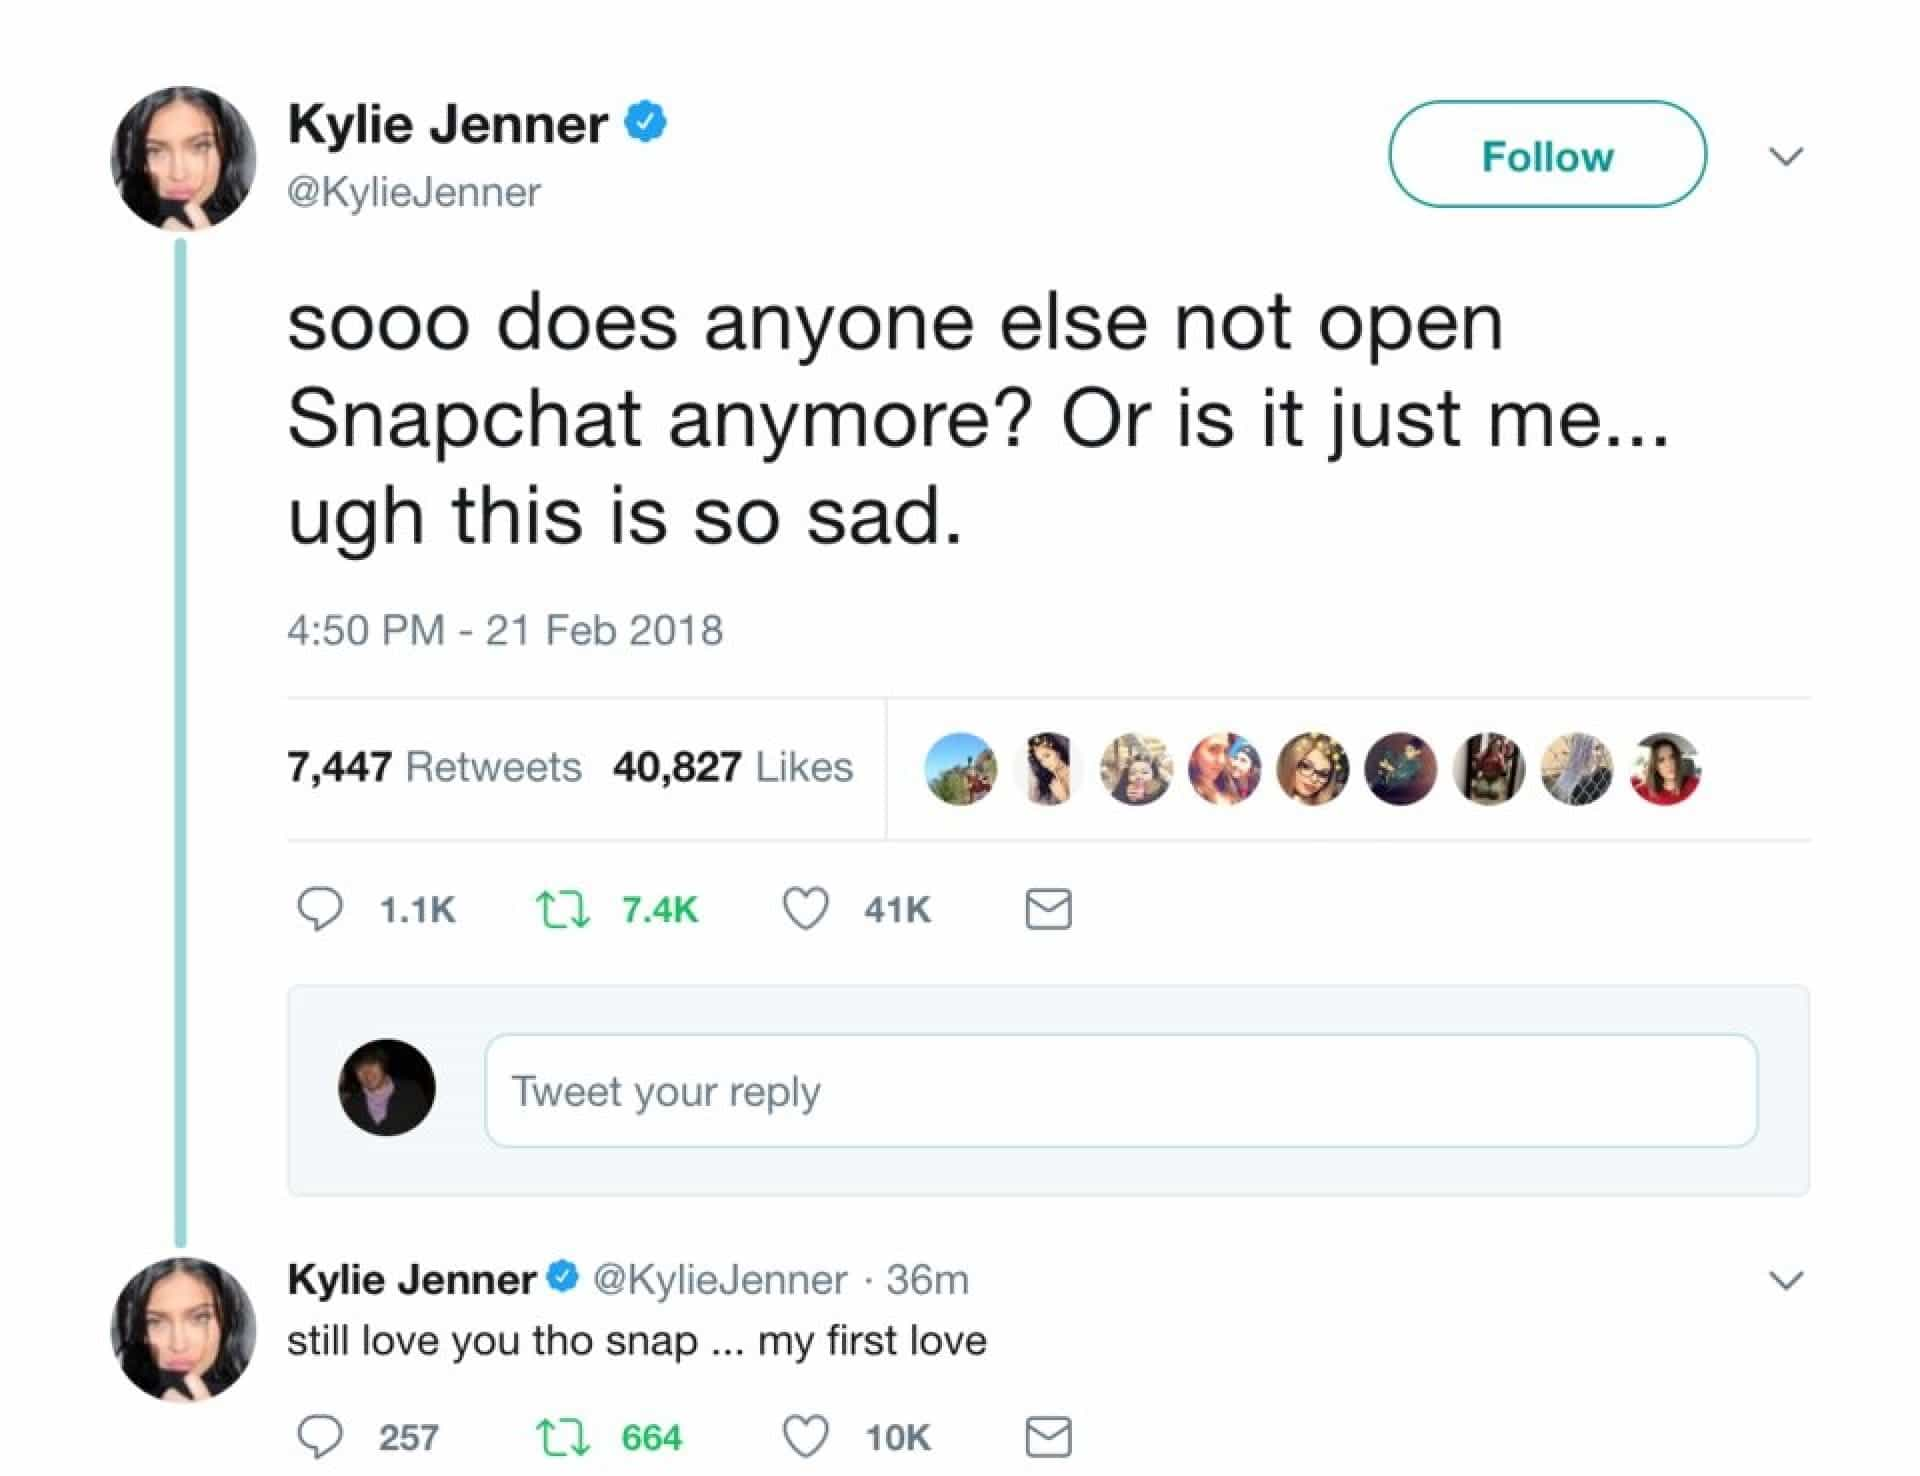 'Morte' do Snapchat pode ter sido assinada por... Kylie Jenner